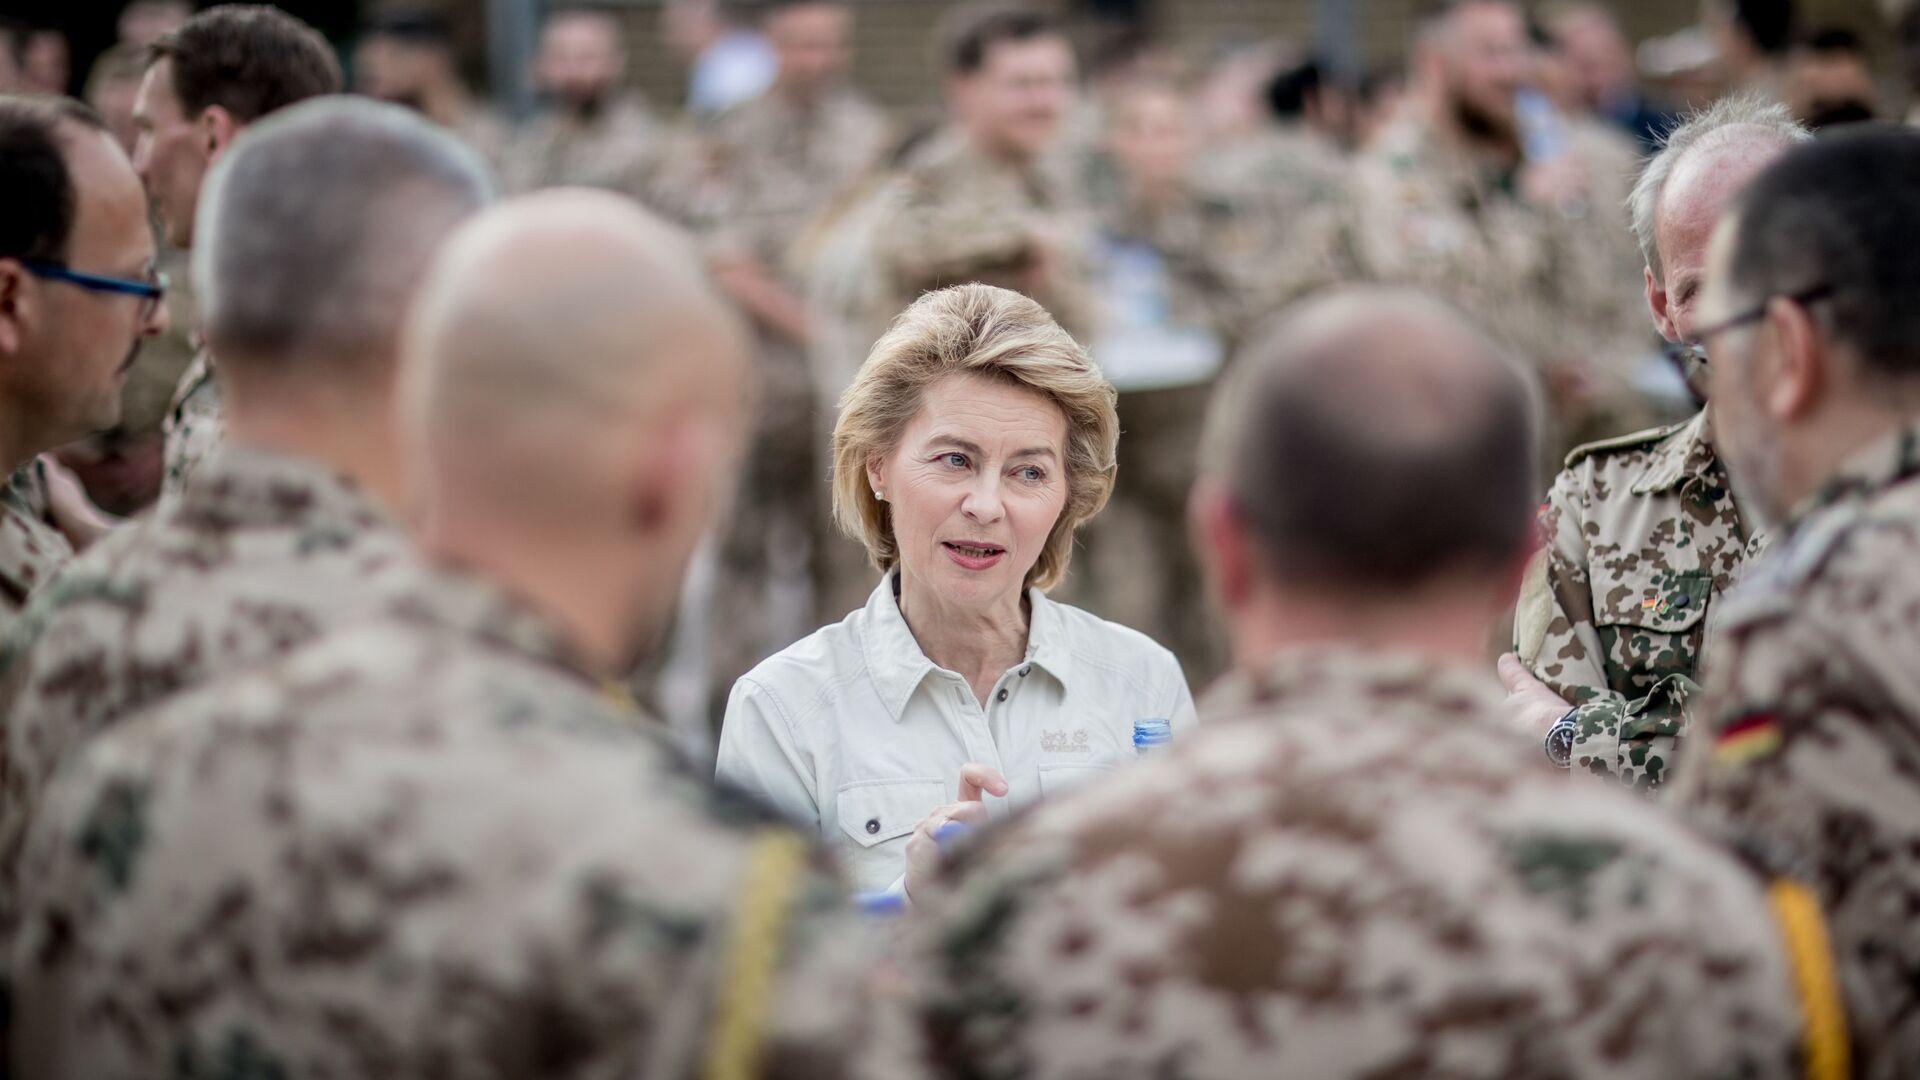 Министр обороны Германии Урсула фон дер Ляйен, 2018 год  - Sputnik Узбекистан, 1920, 18.09.2021